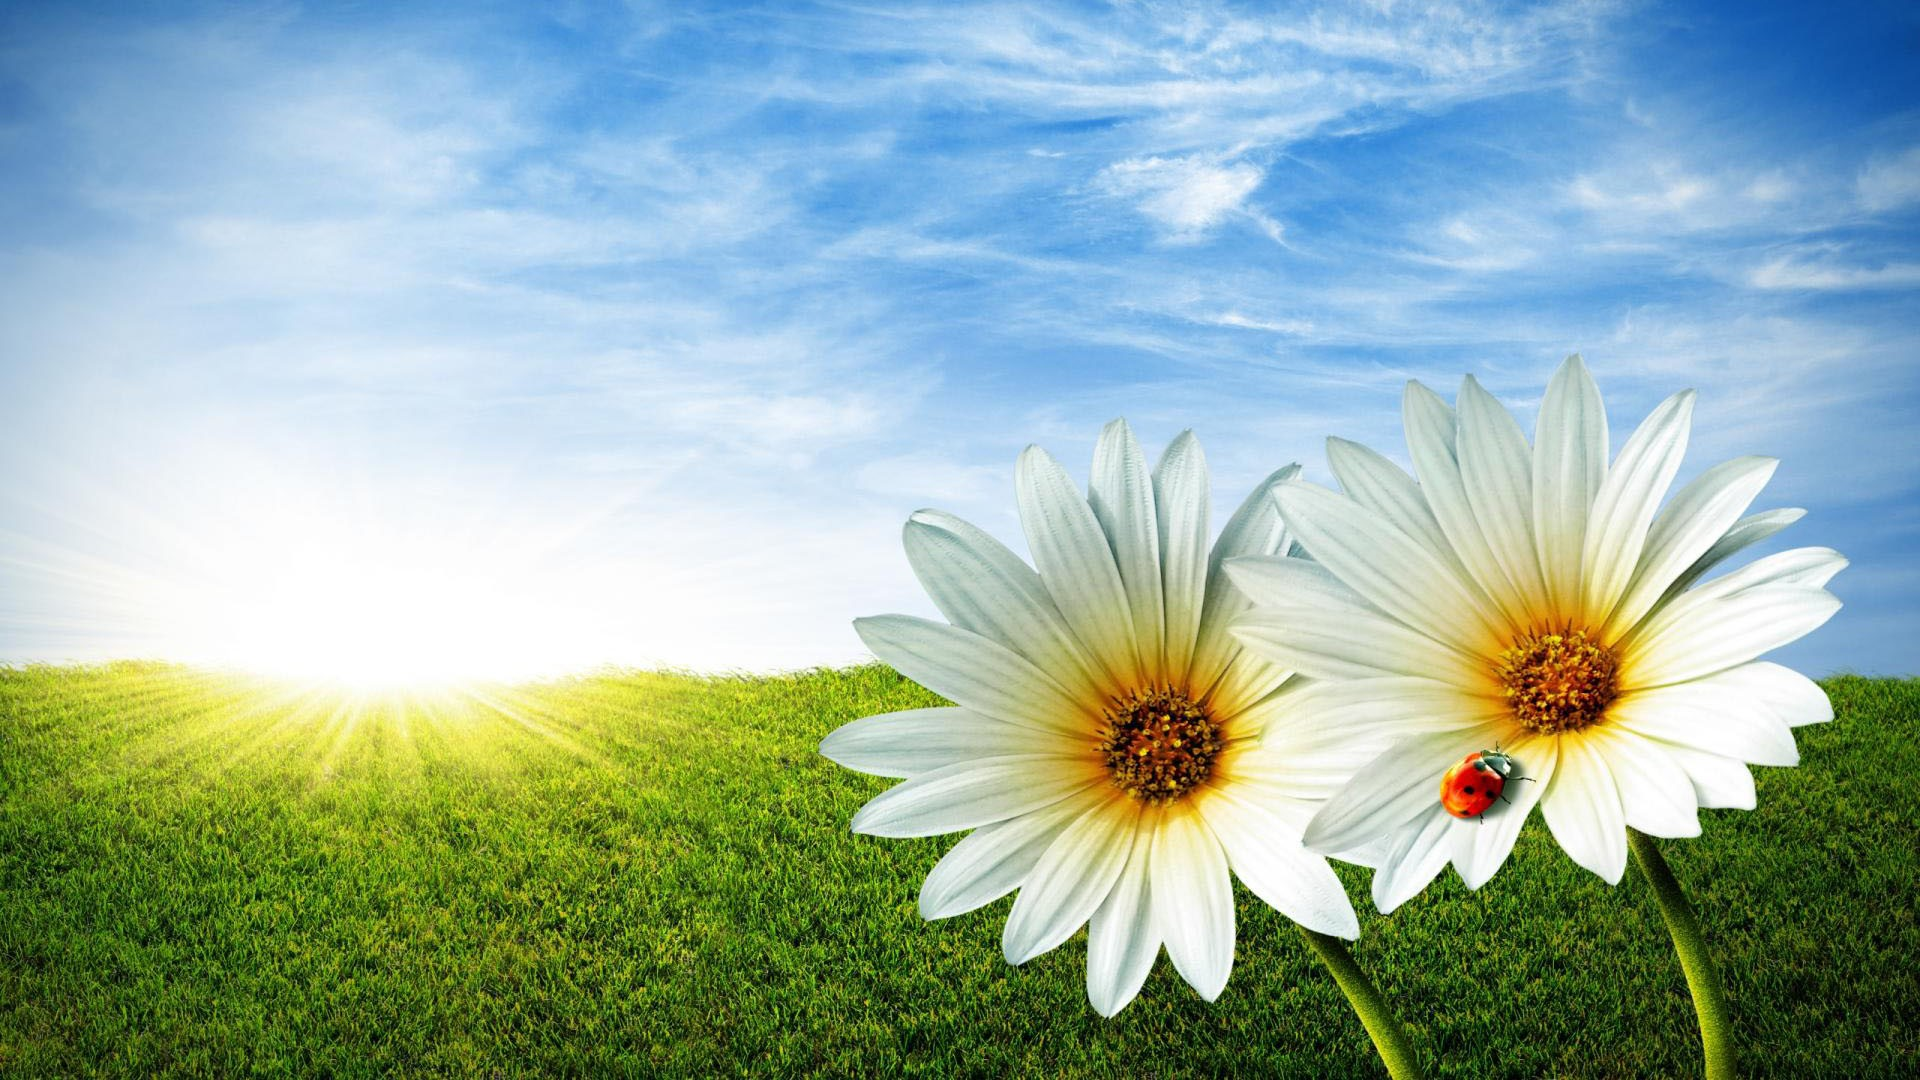 Free Download 1080p Nature Wallpapers For Desktop Hd Desktop